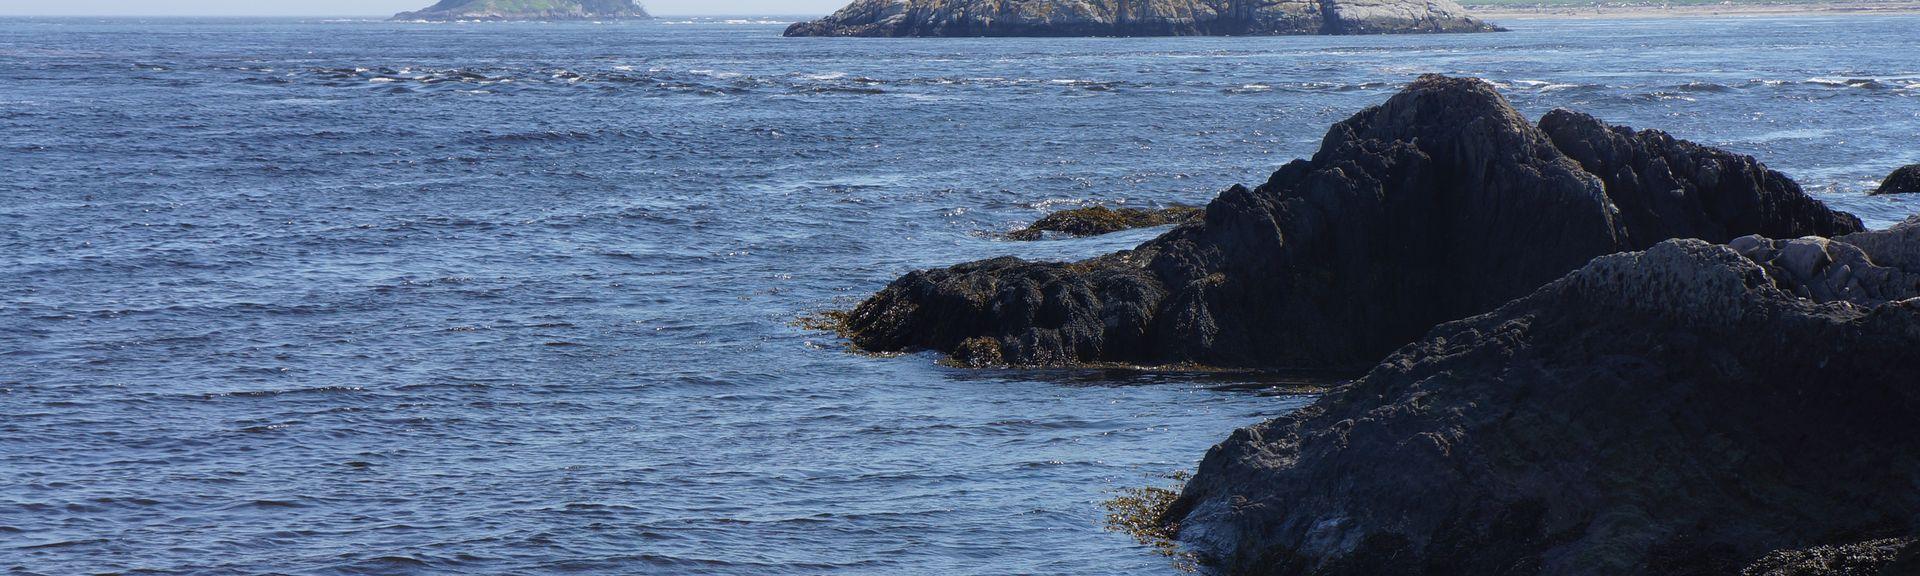 Linekin Bay, Boothbay, Maine, Verenigde Staten